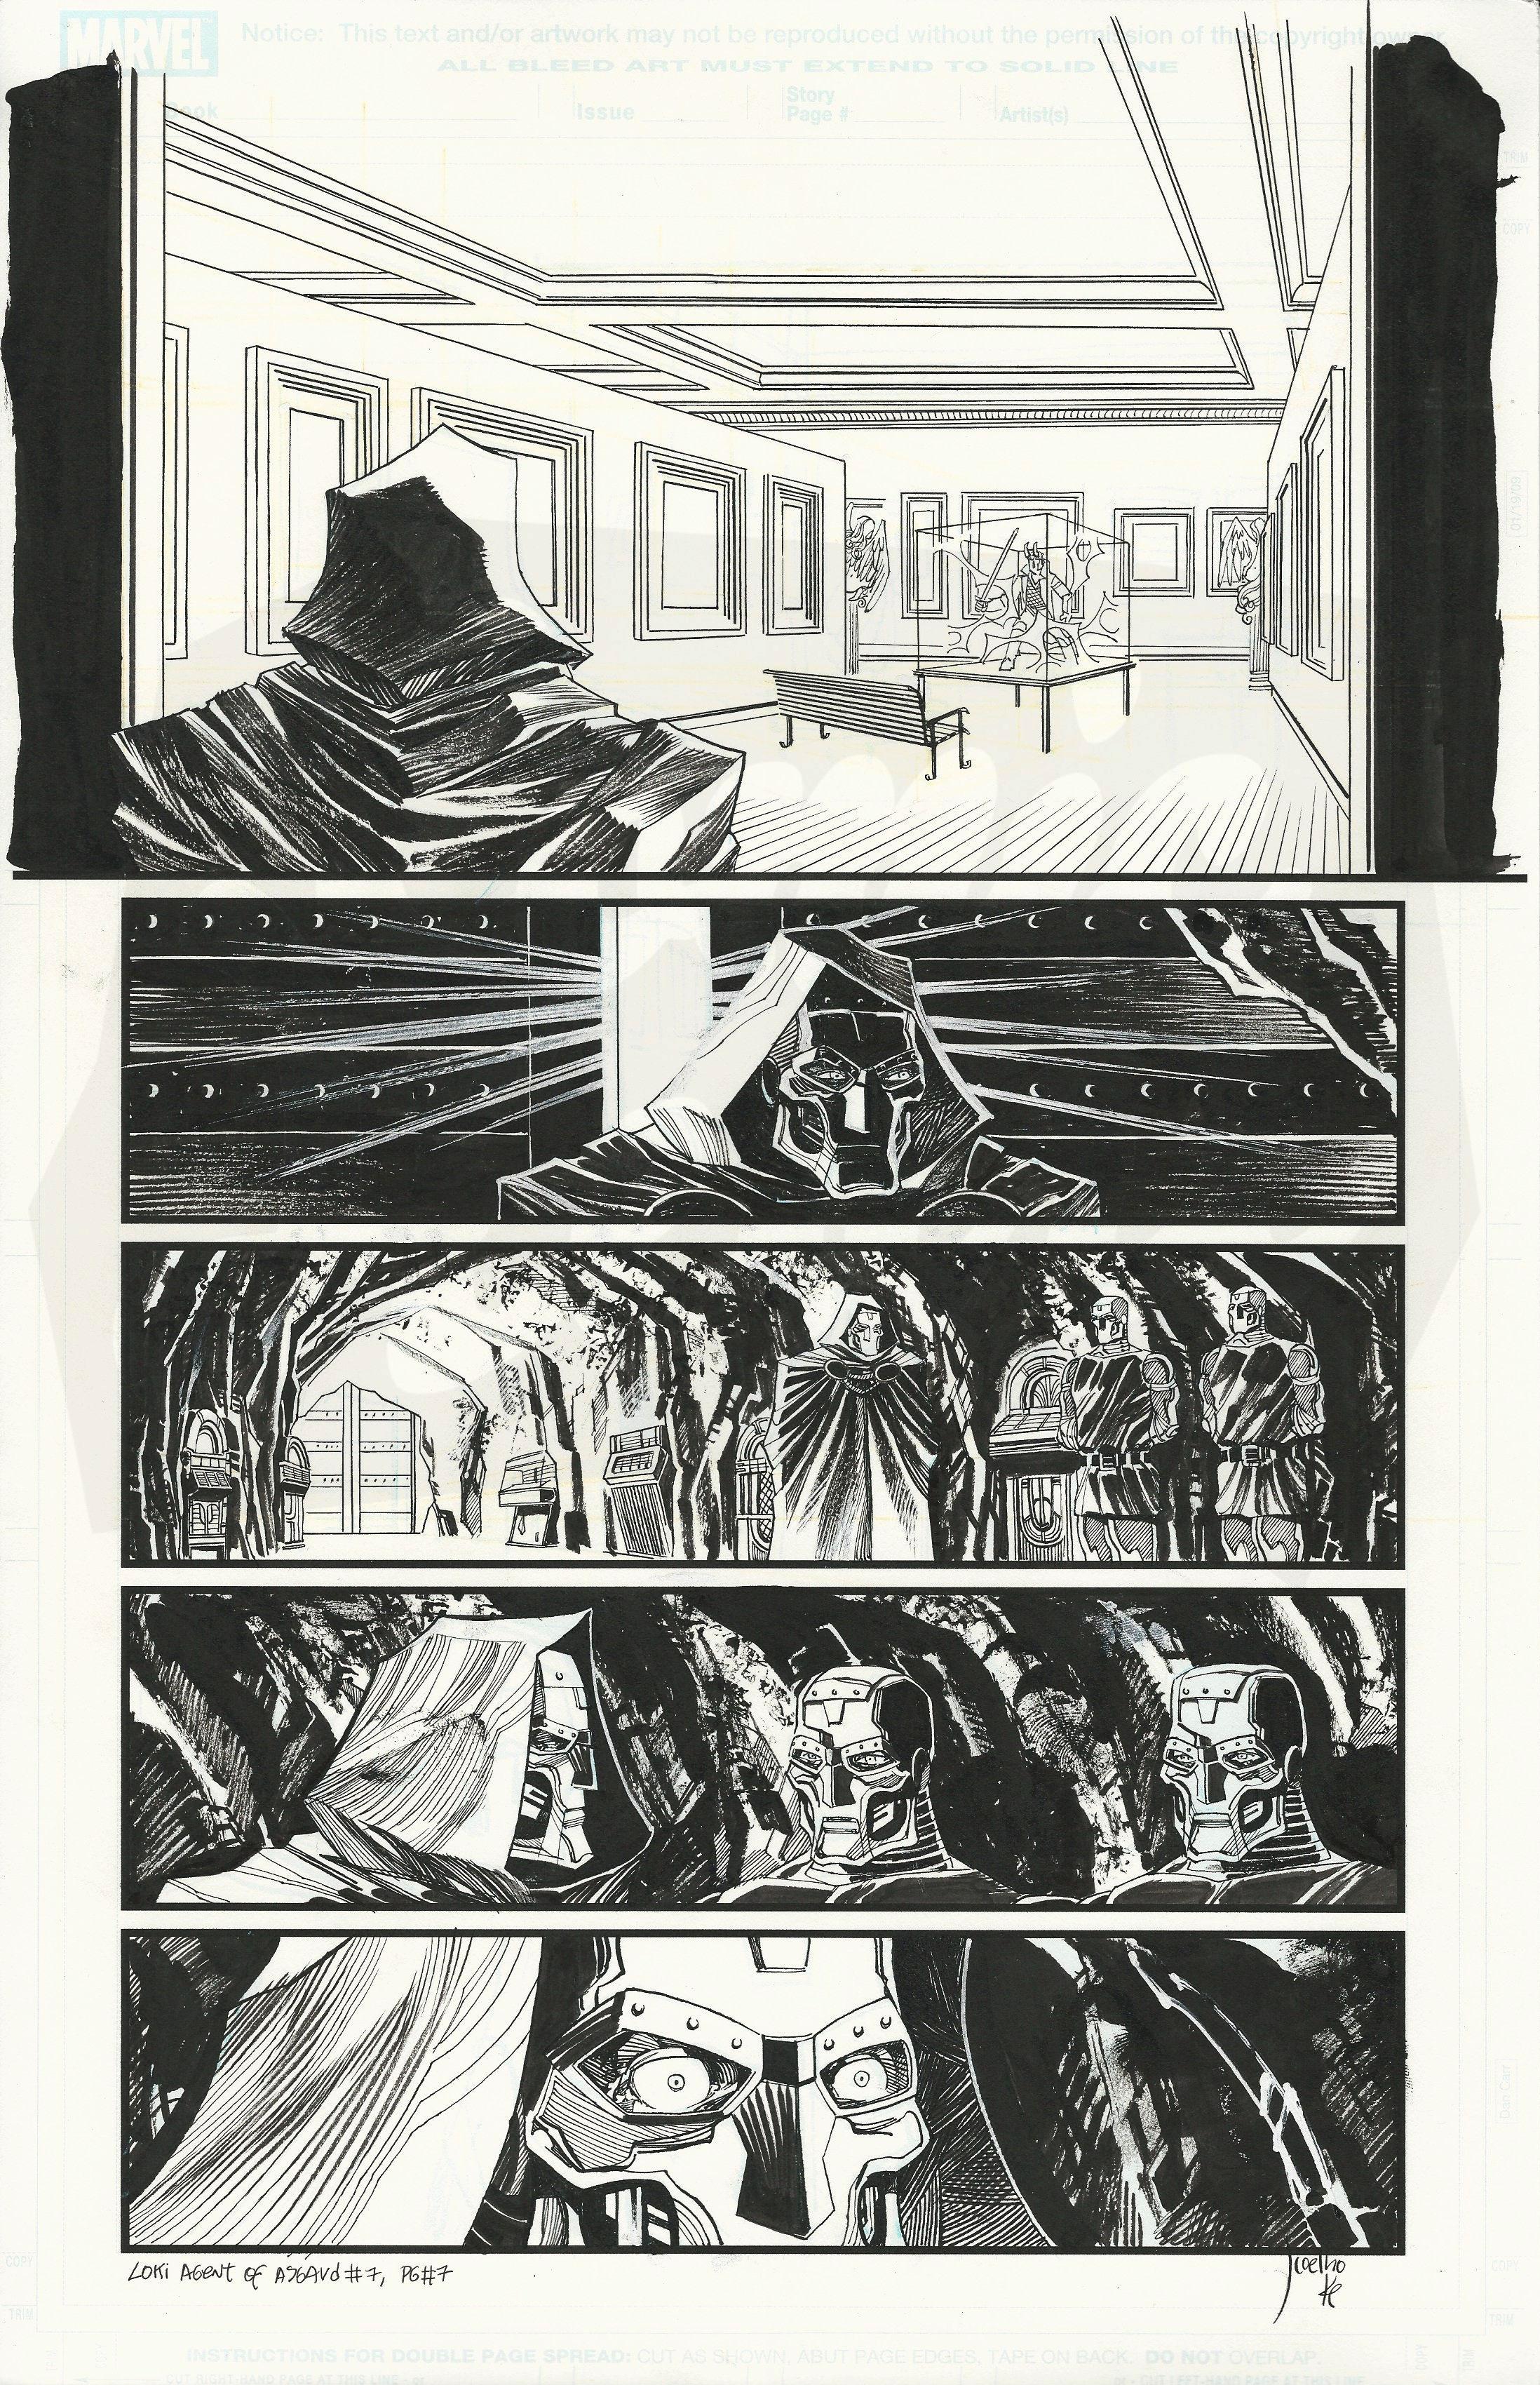 Loki: Agent of Asgard #7, Page 7